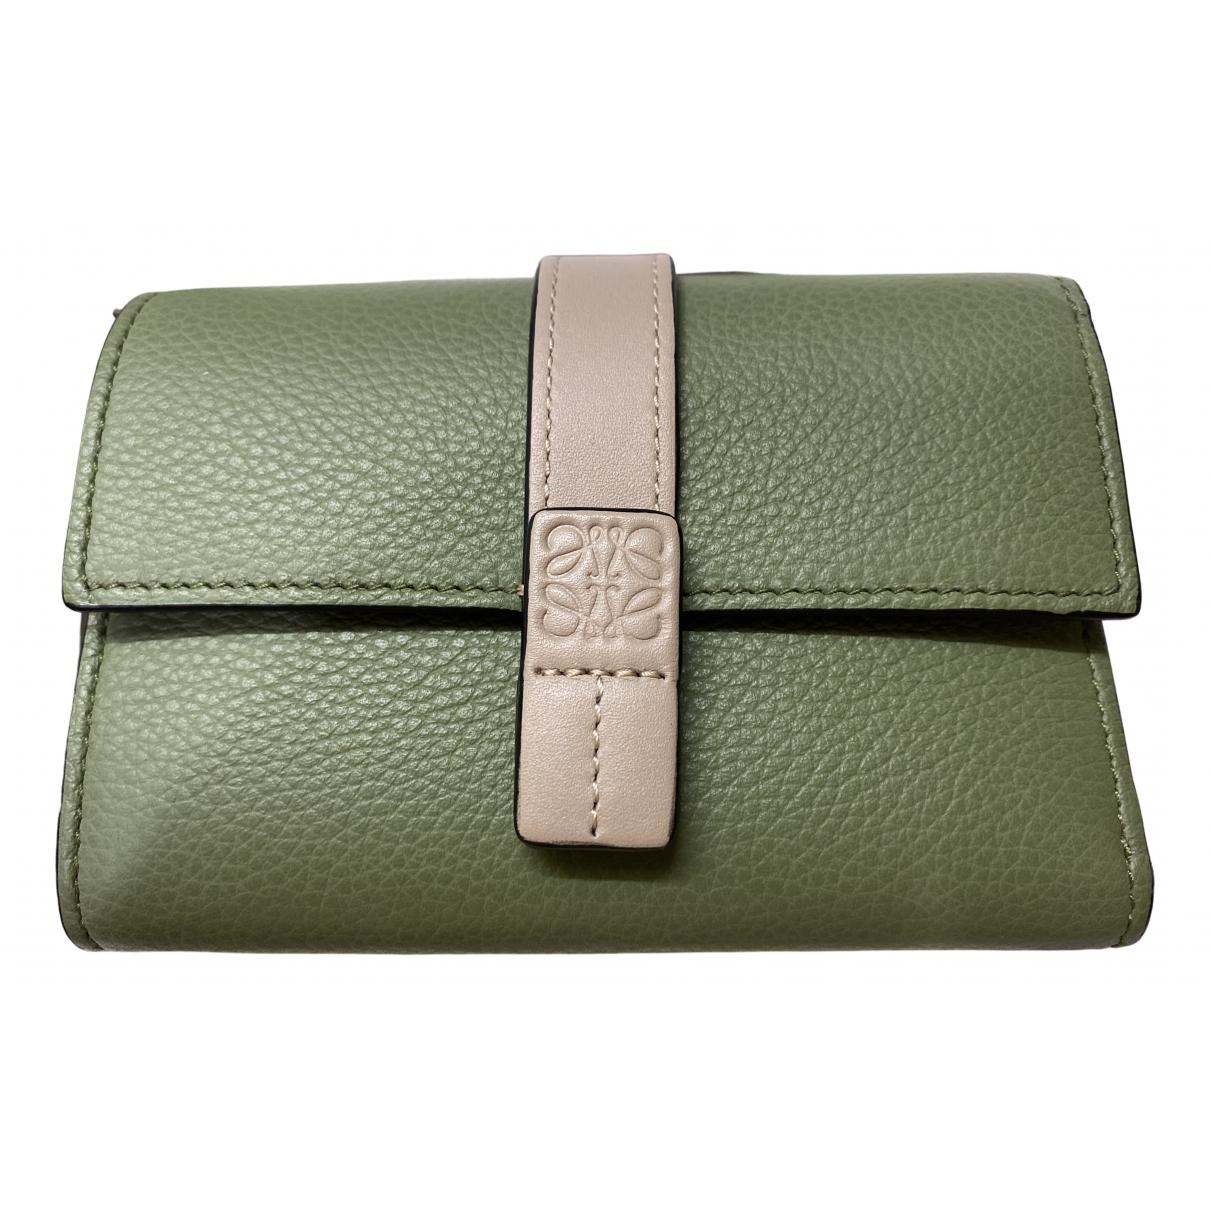 Loewe - Portefeuille   pour femme en cuir - vert